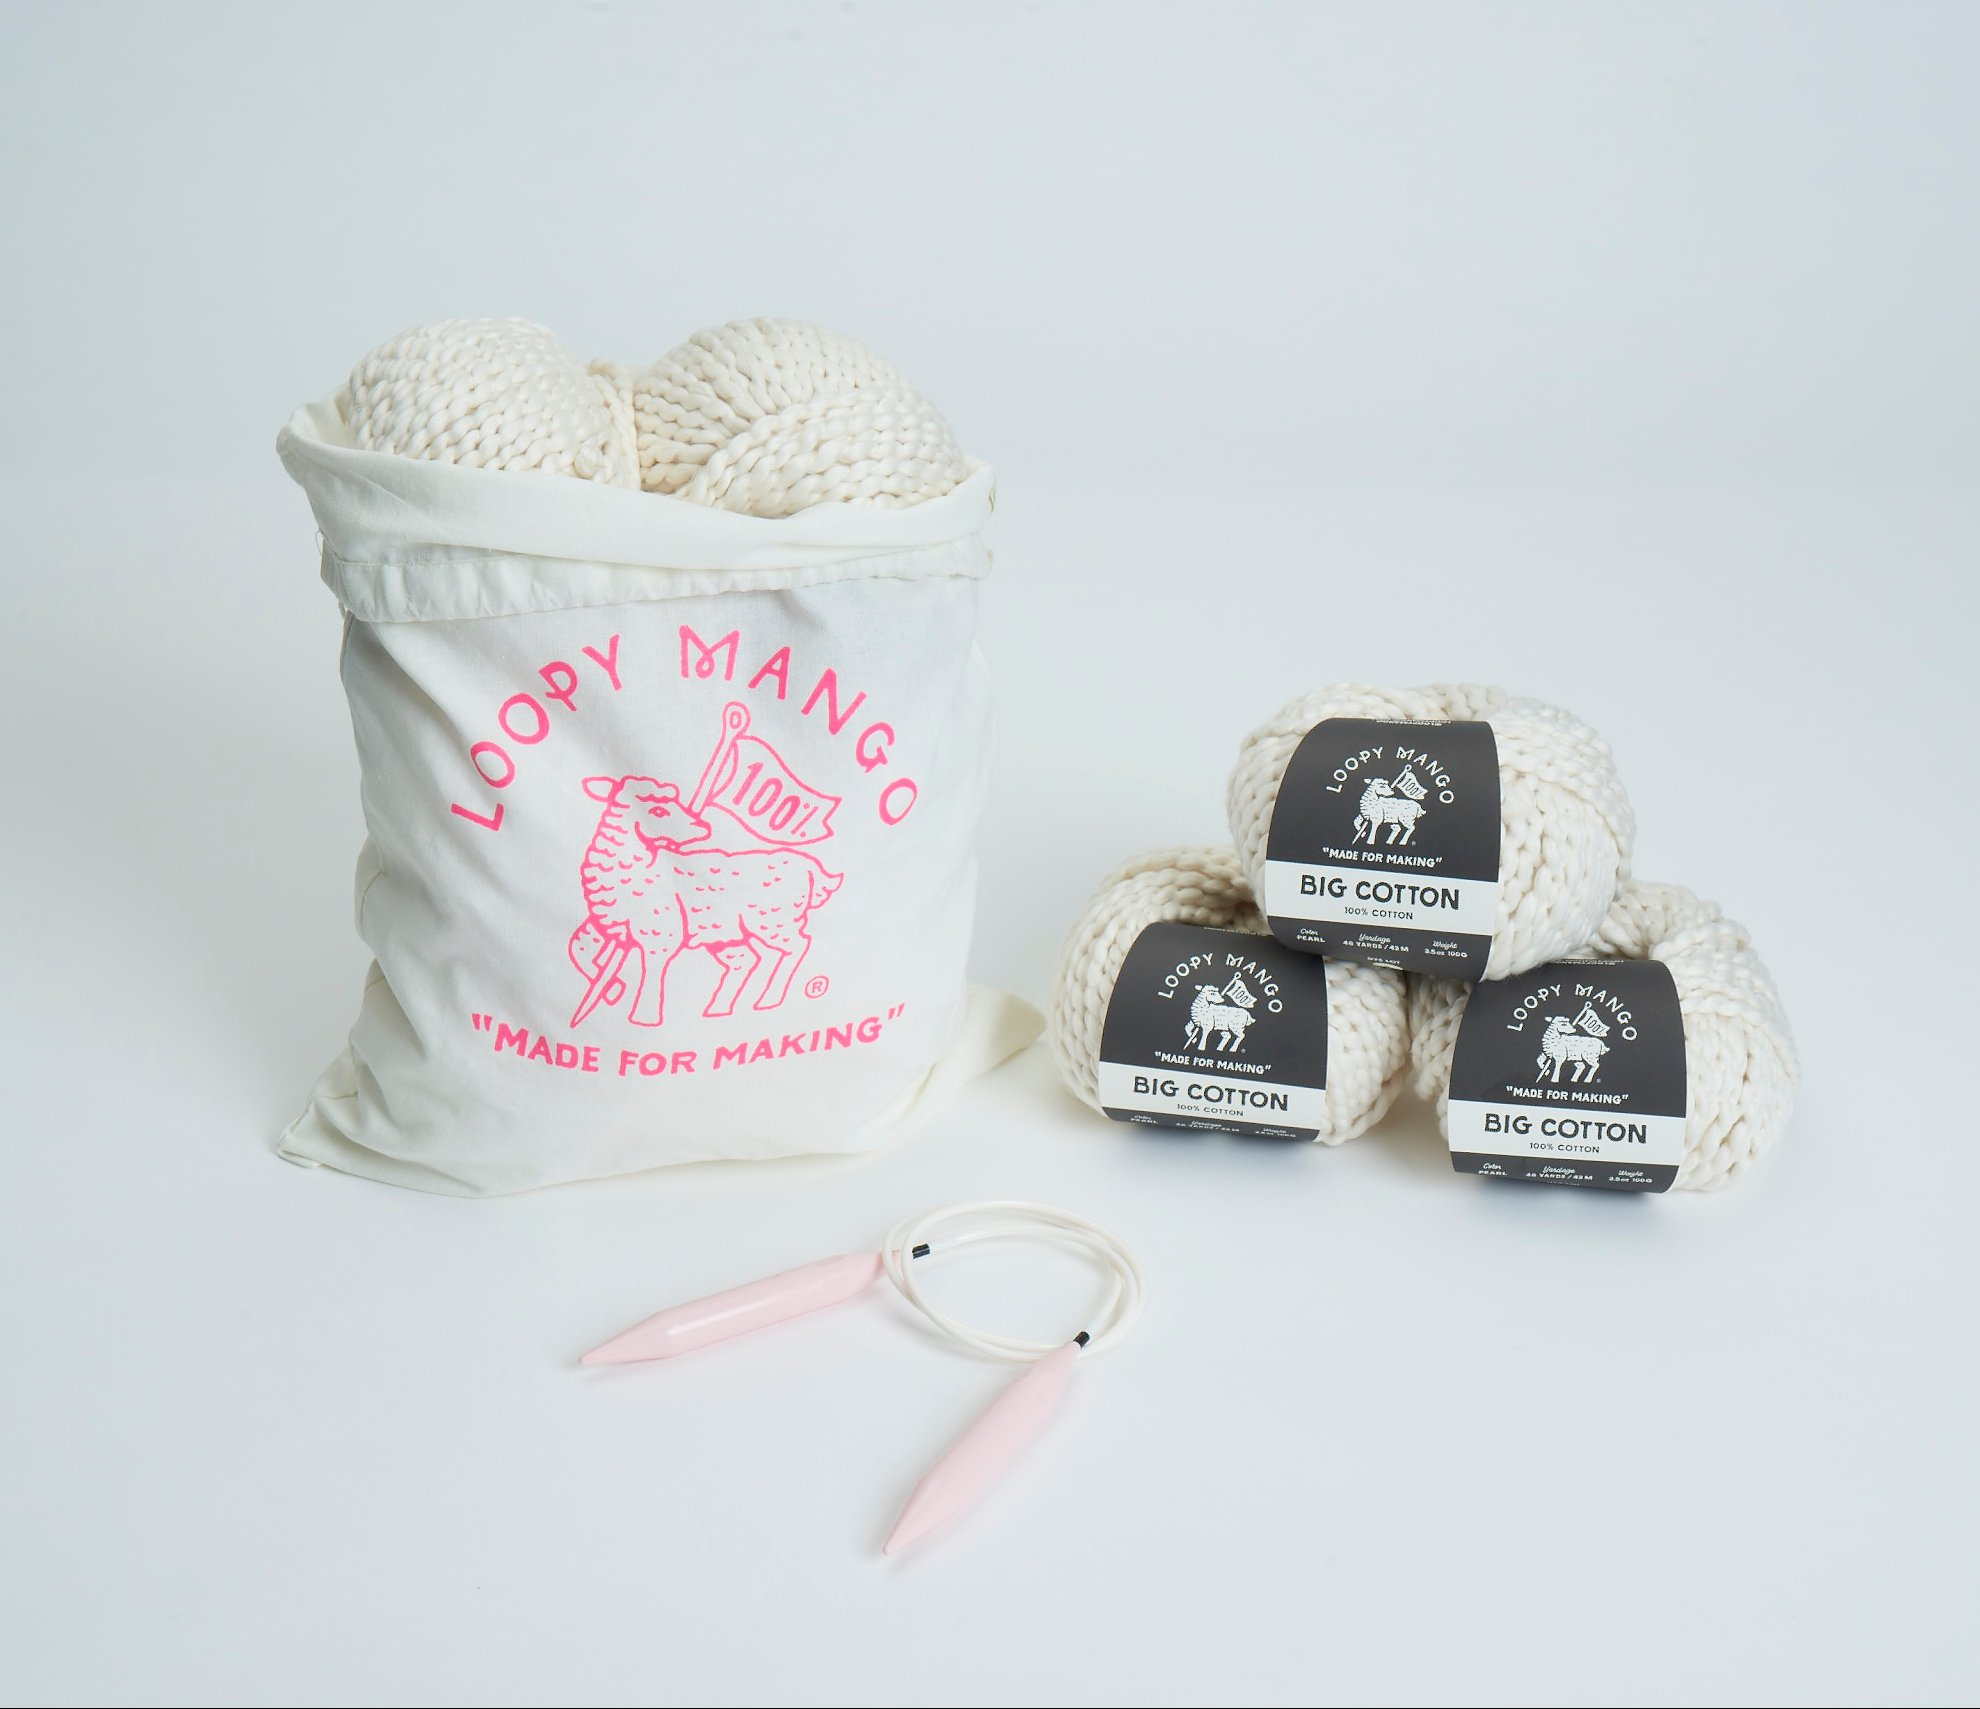 Loopy Mango DIY Kit - Cotton Baby Blanket-Tahitian Pearl by Loopy Mango (Image #2)